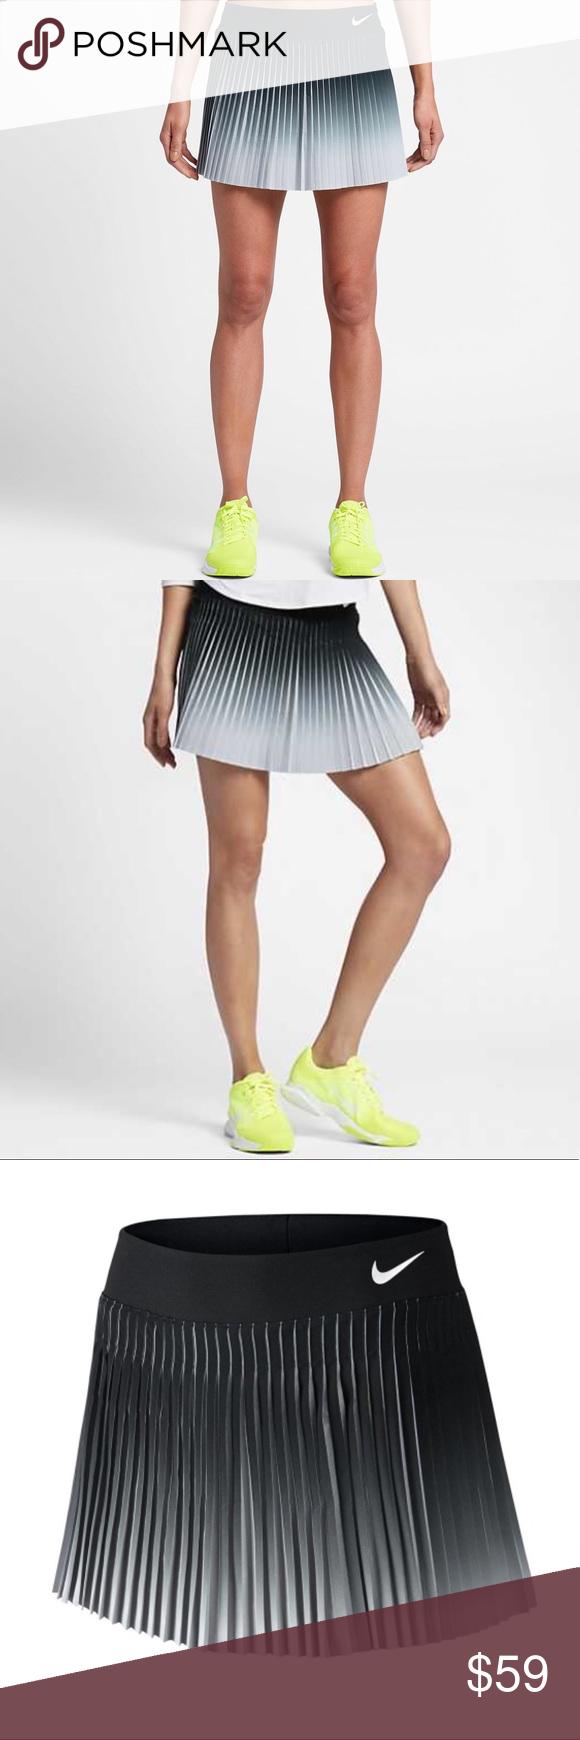 Nike Court Flex Victory Skirt Nwt Gray Black Pleated Tennis Skirt With Black Shorts Underneath This Skirt Has Pleated Tennis Skirt Tennis Clothes Nike Skirts